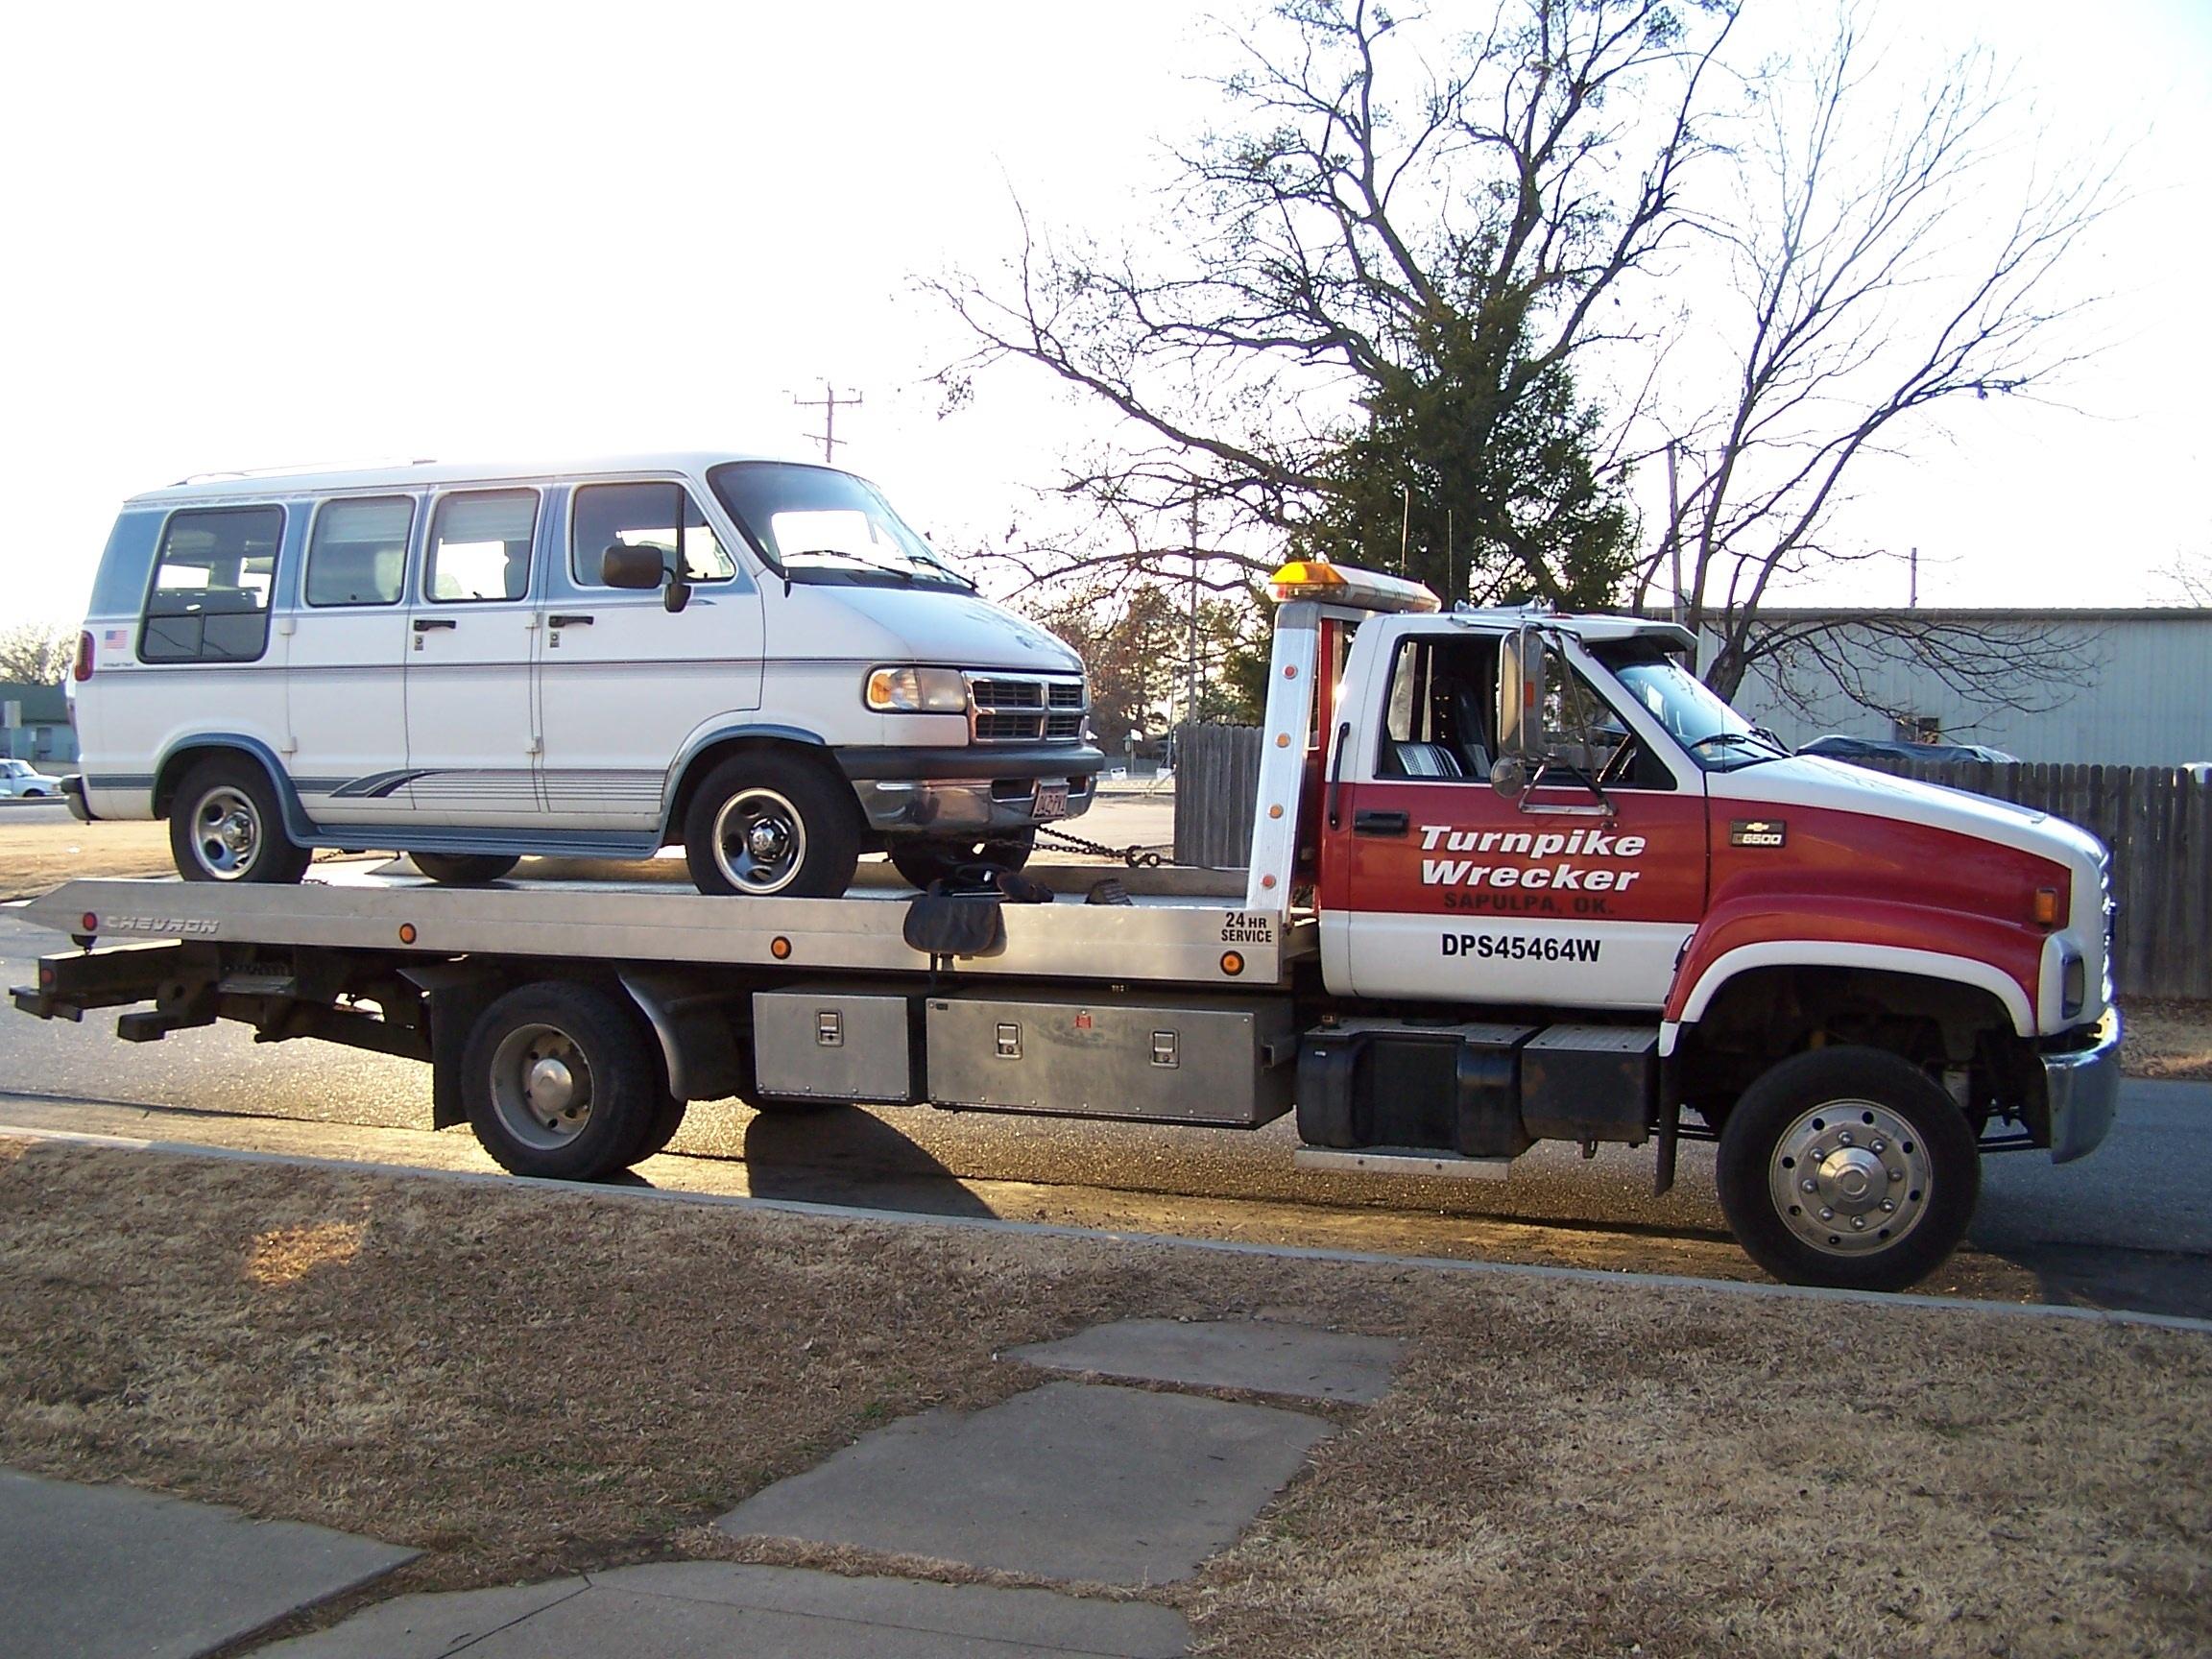 Free Images : car, transport, motor vehicle, bumper, wrecker ...